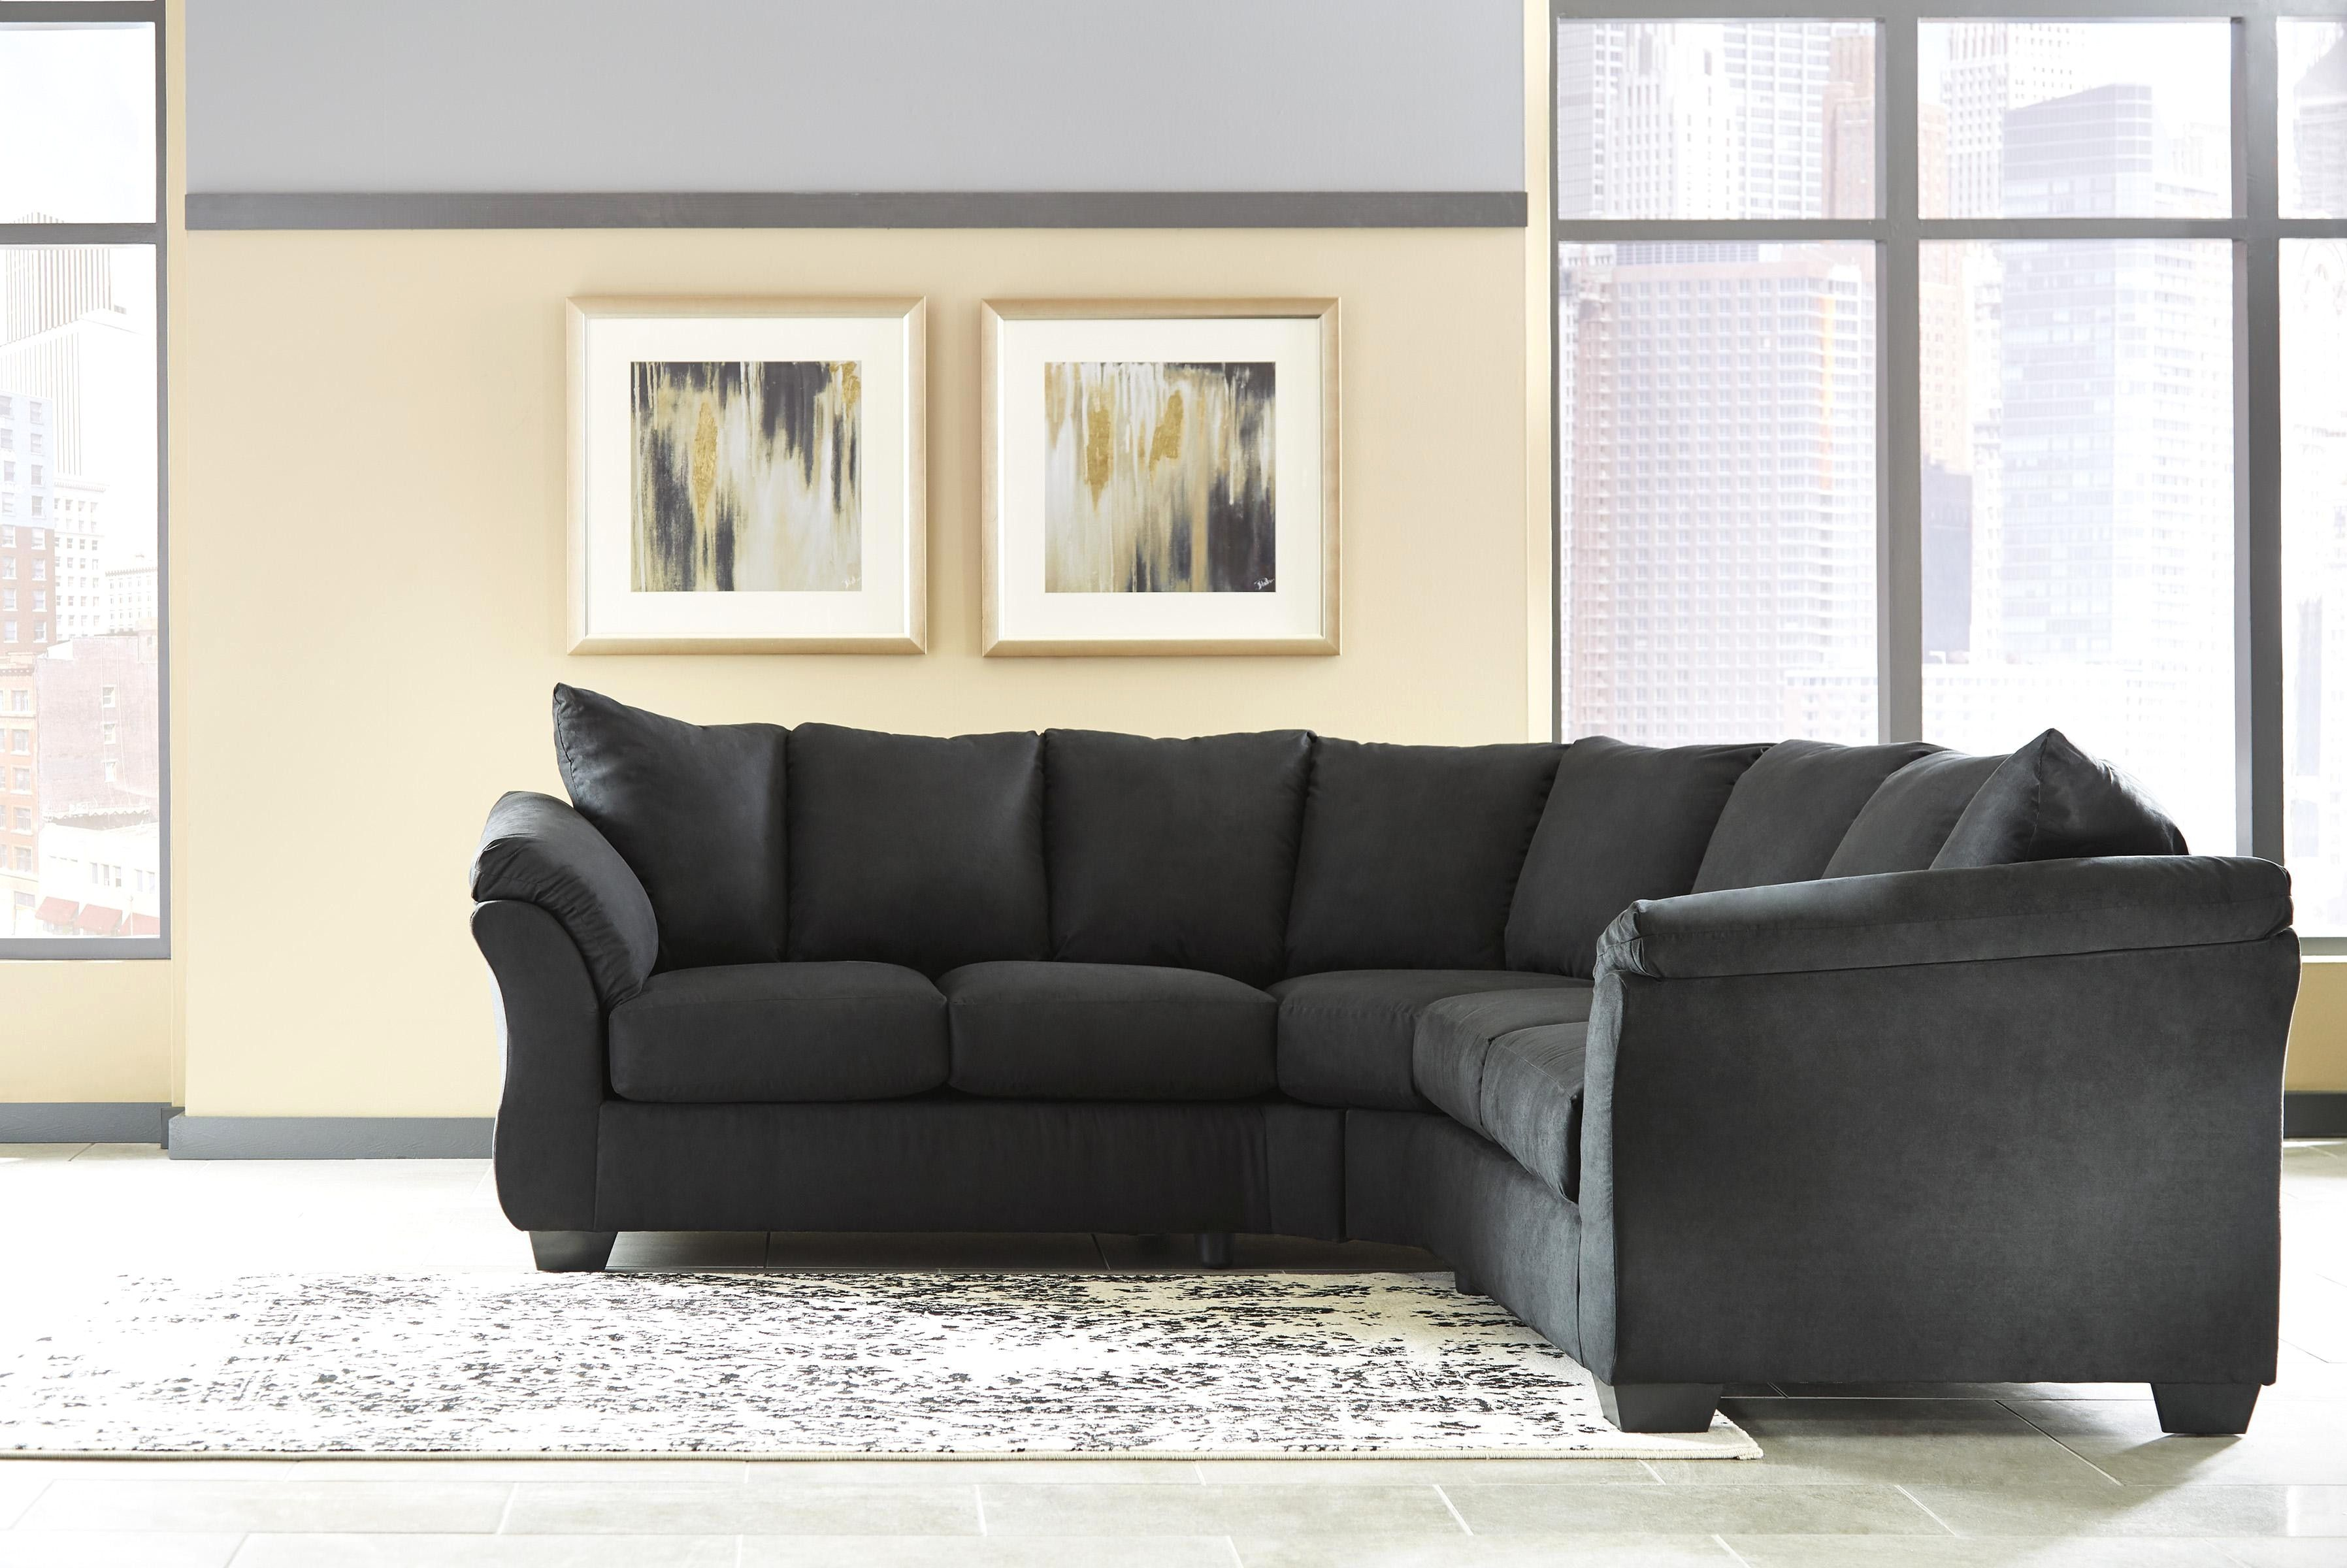 30 Schöne Denim Sofa Ikea Sofa design, Shabby chic sofa